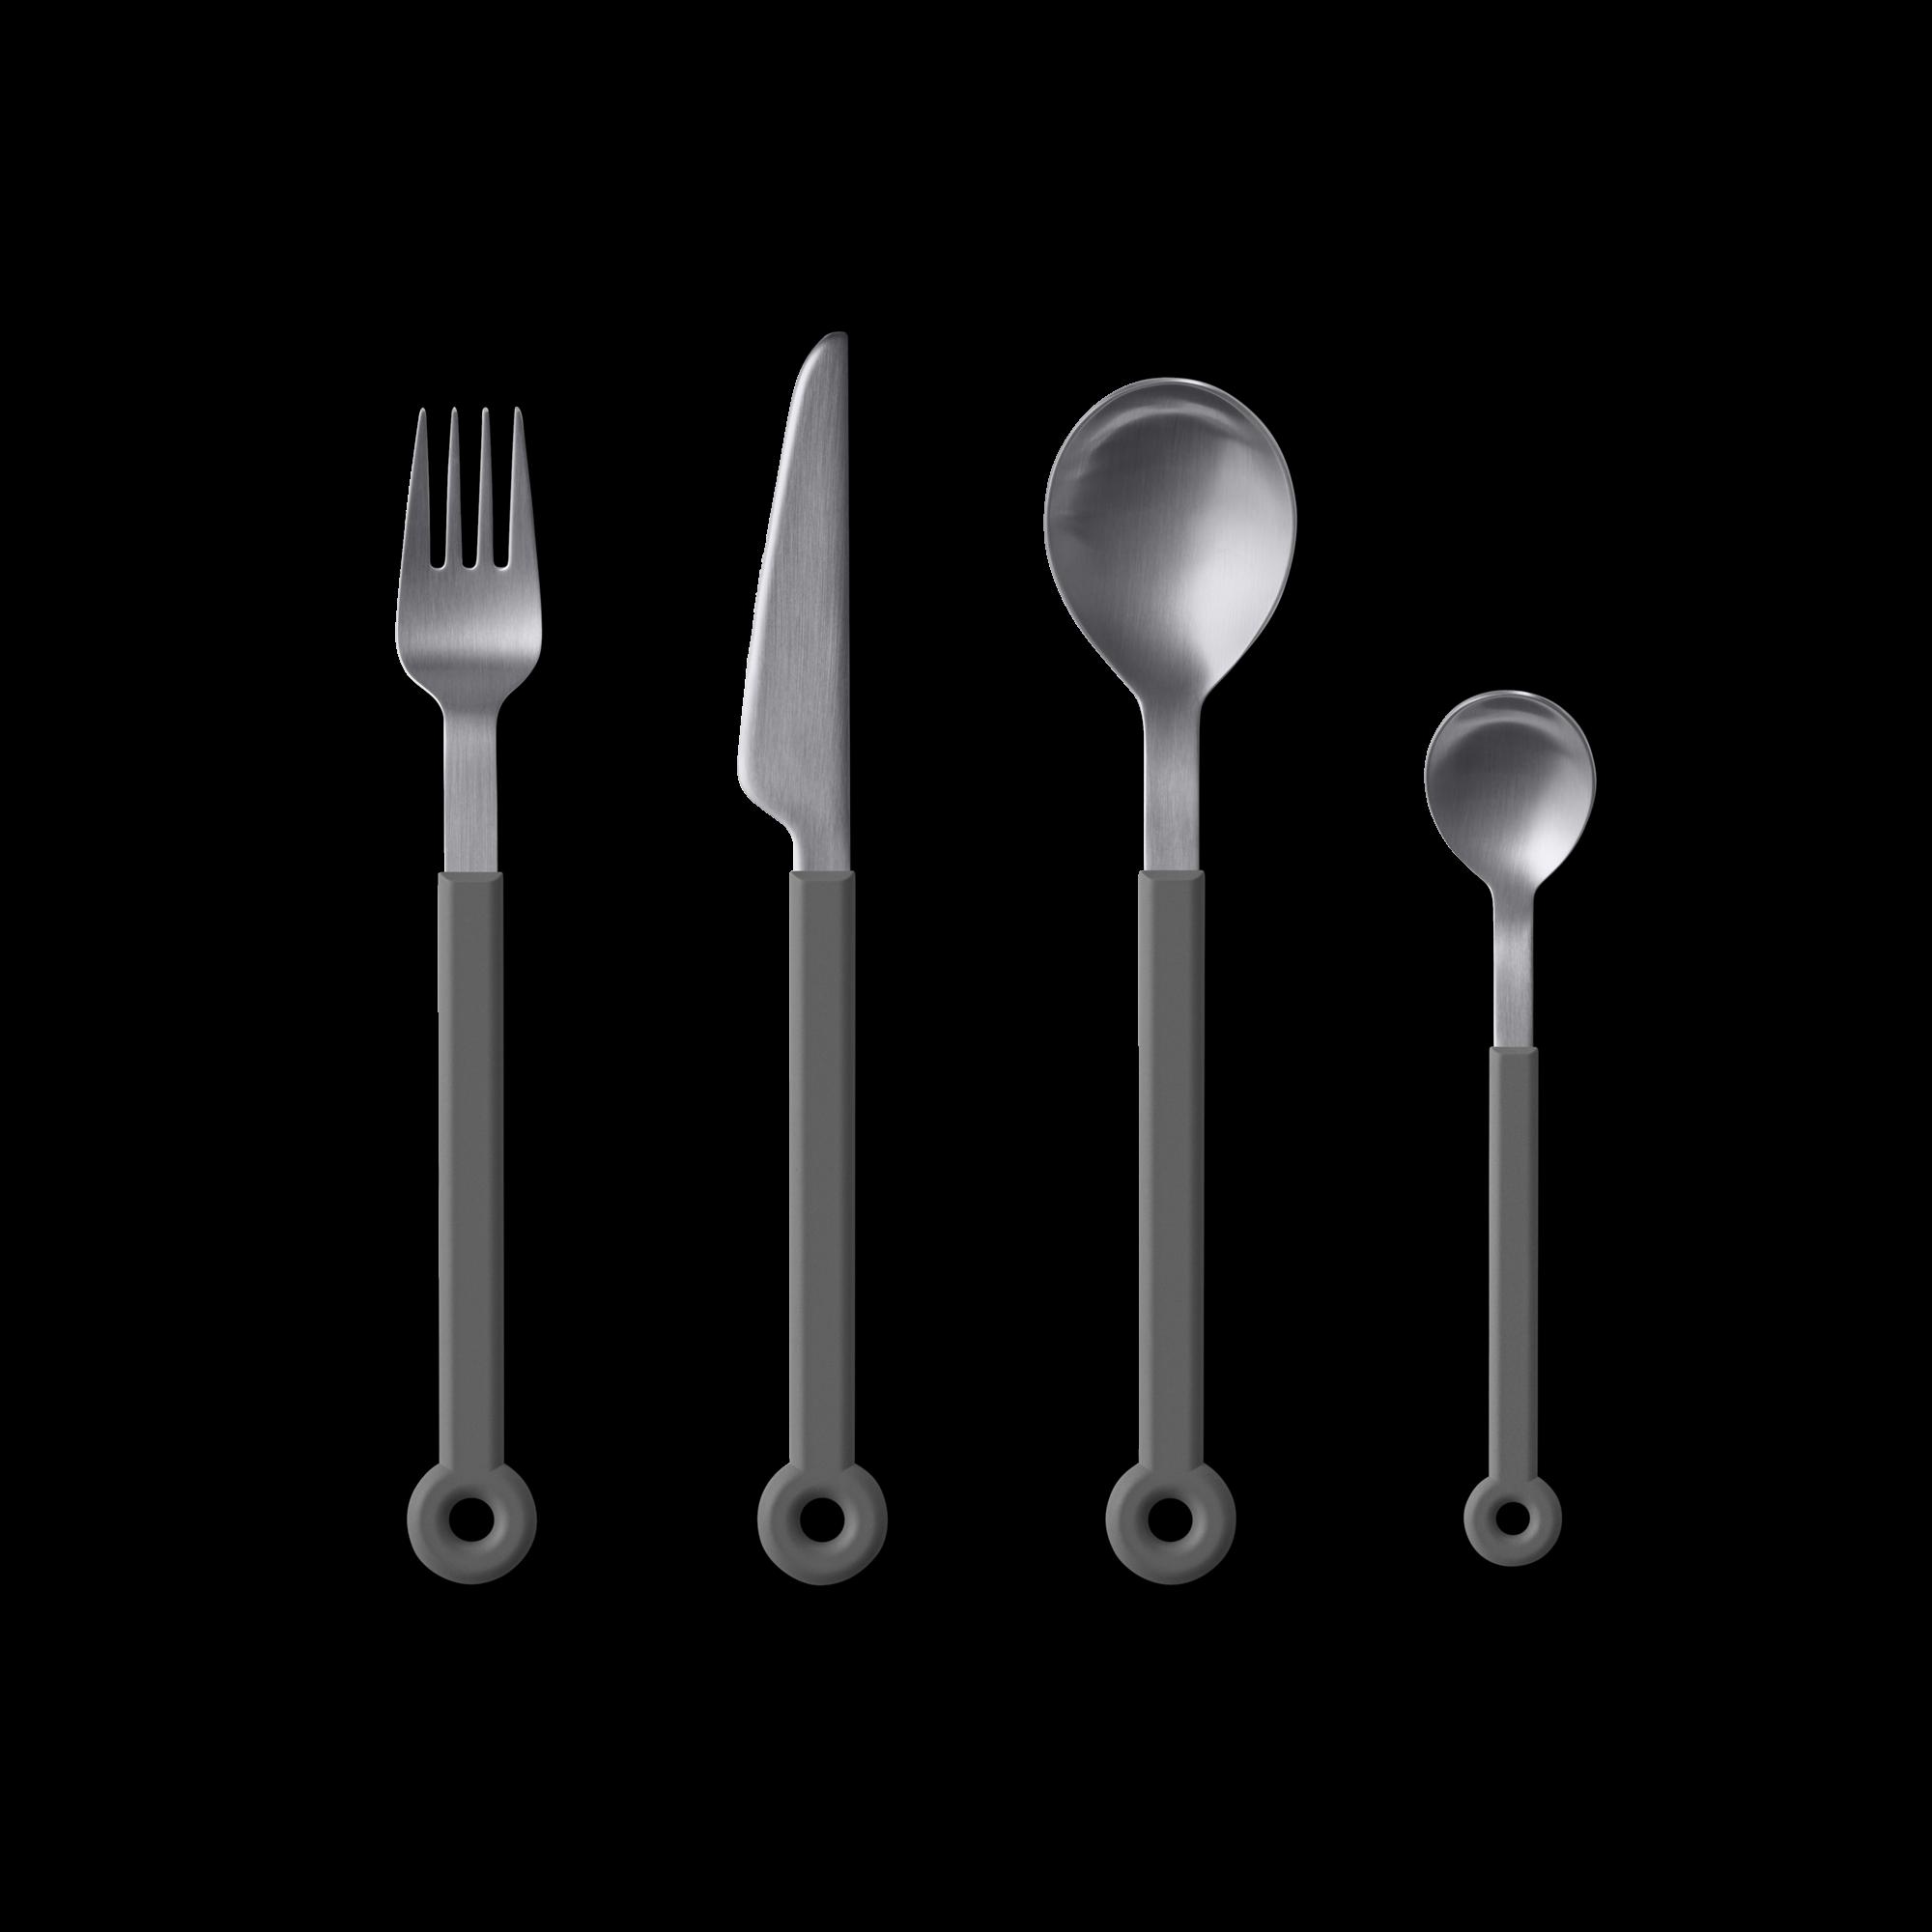 mono-ring-flatware-4-piece-set-grey-1